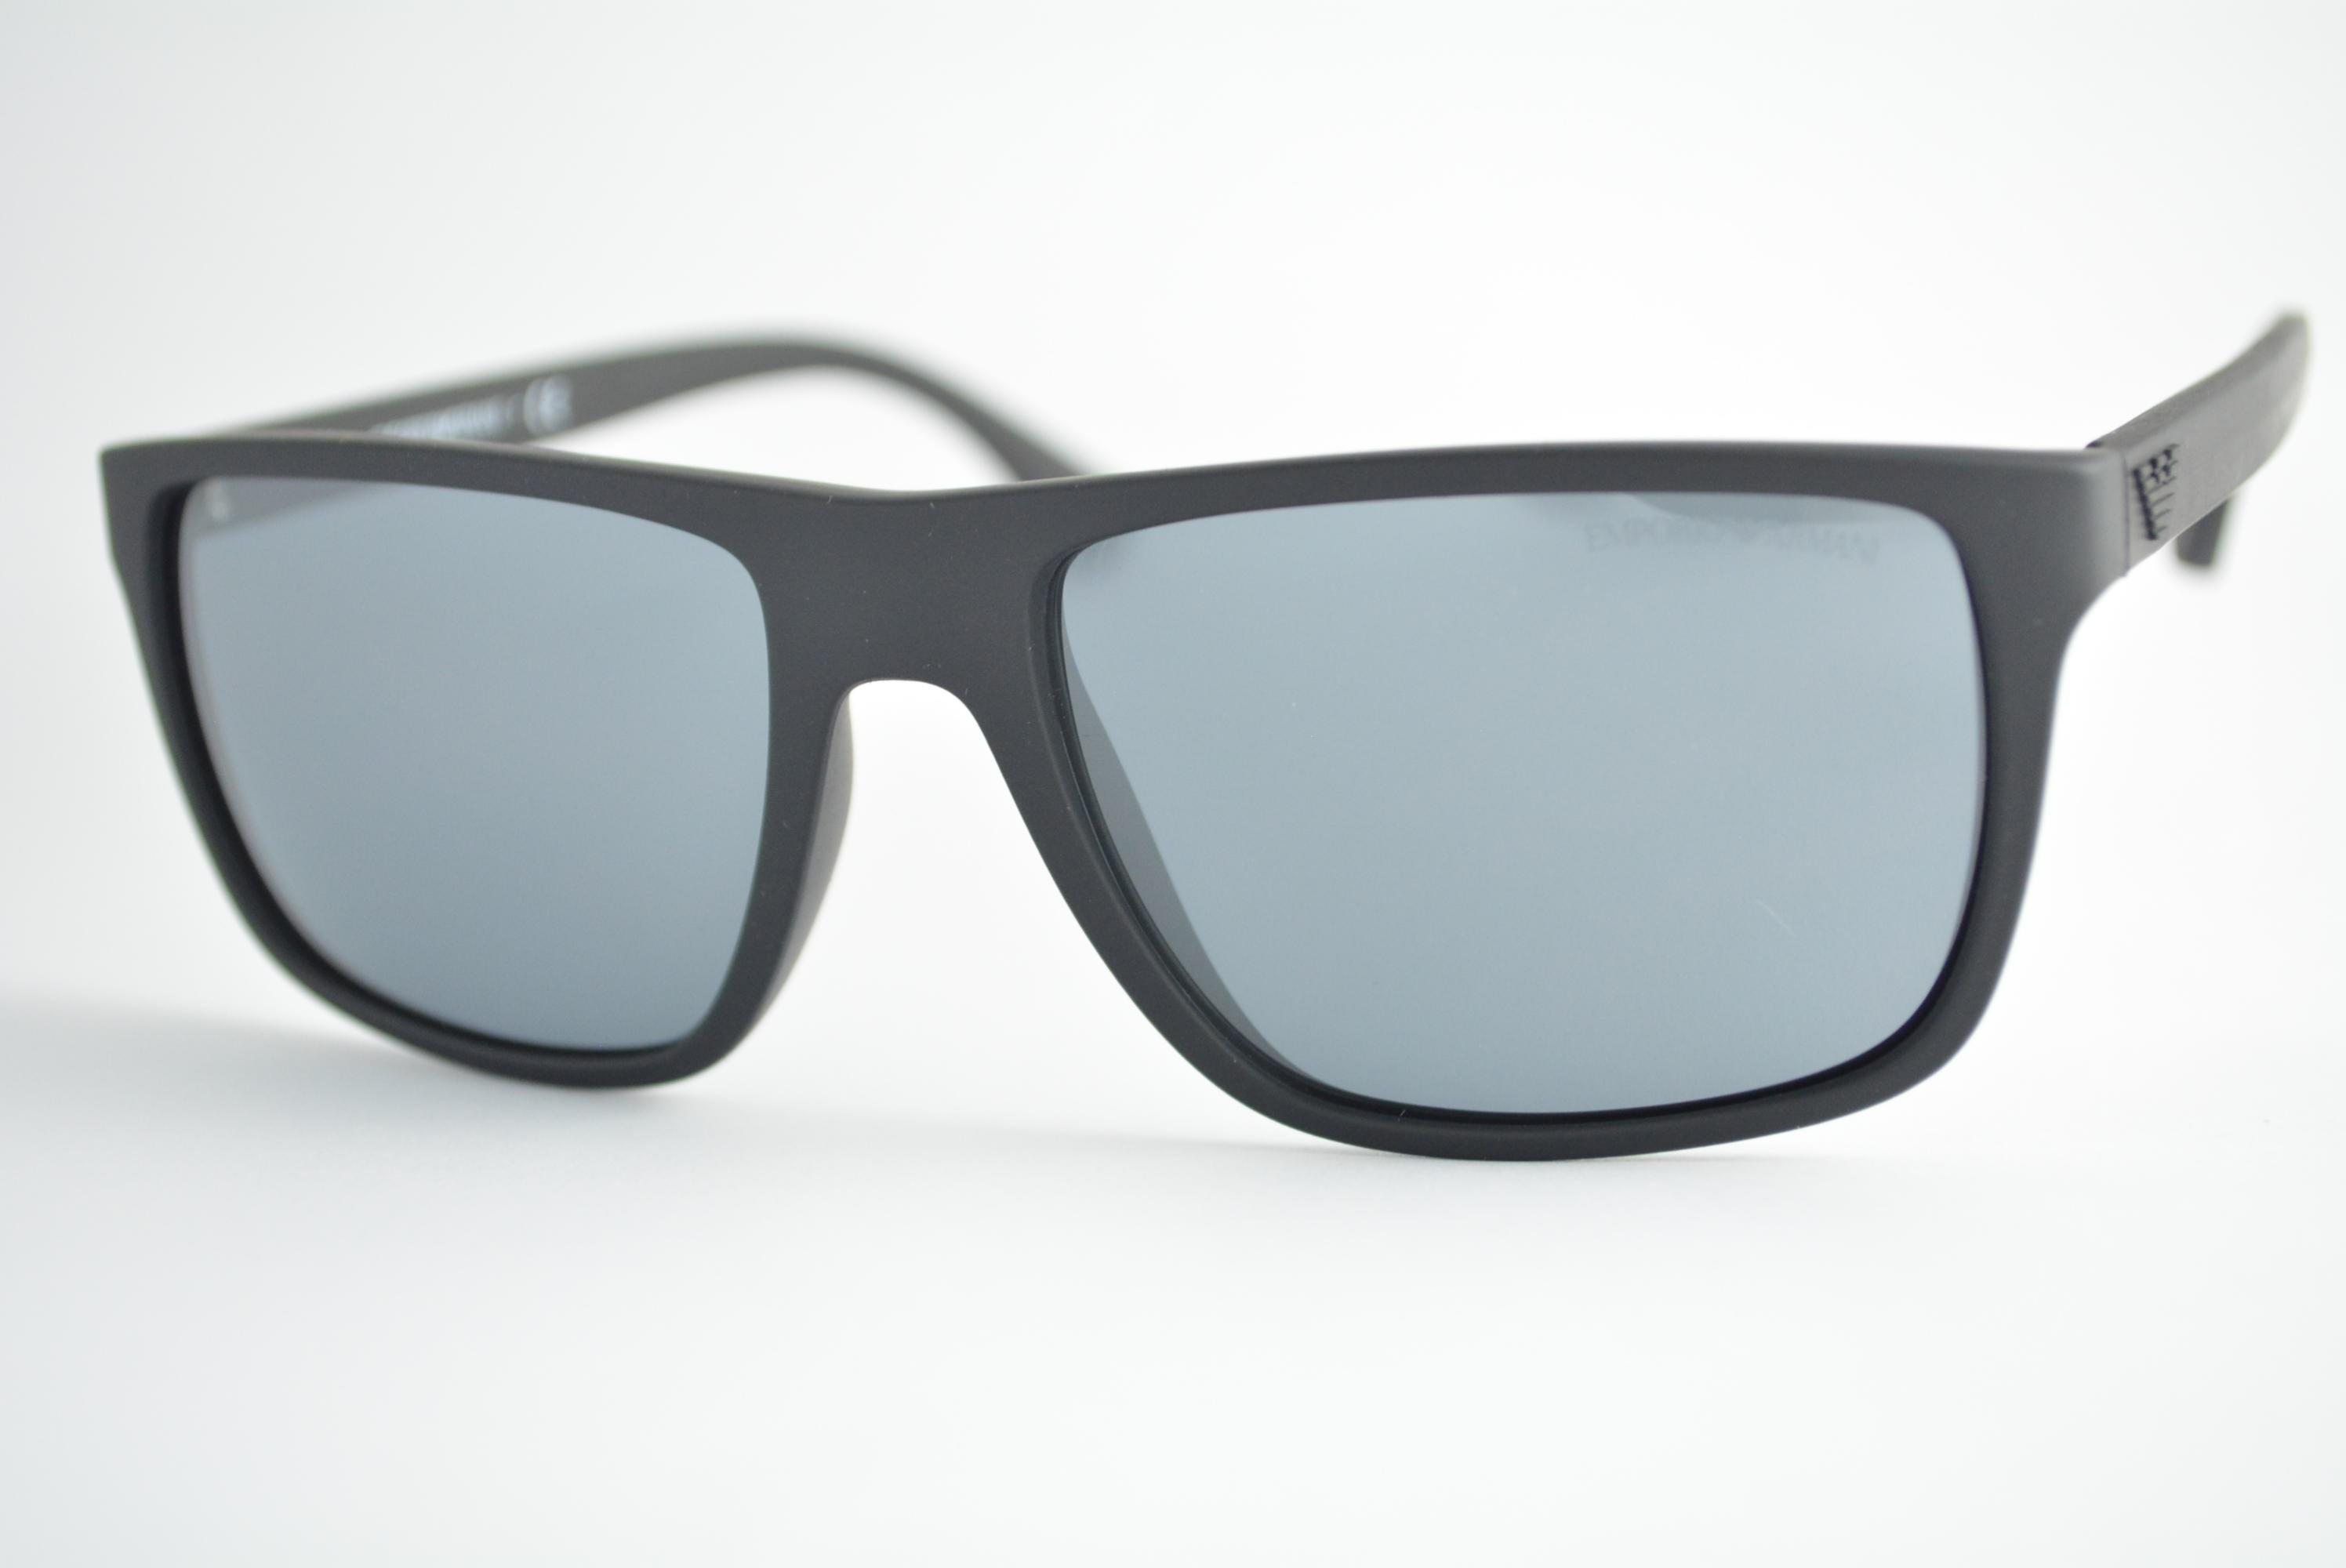 óculos de sol Emporio Armani mod EA4033 5649 6q Ótica Cardoso f2eaa5a903